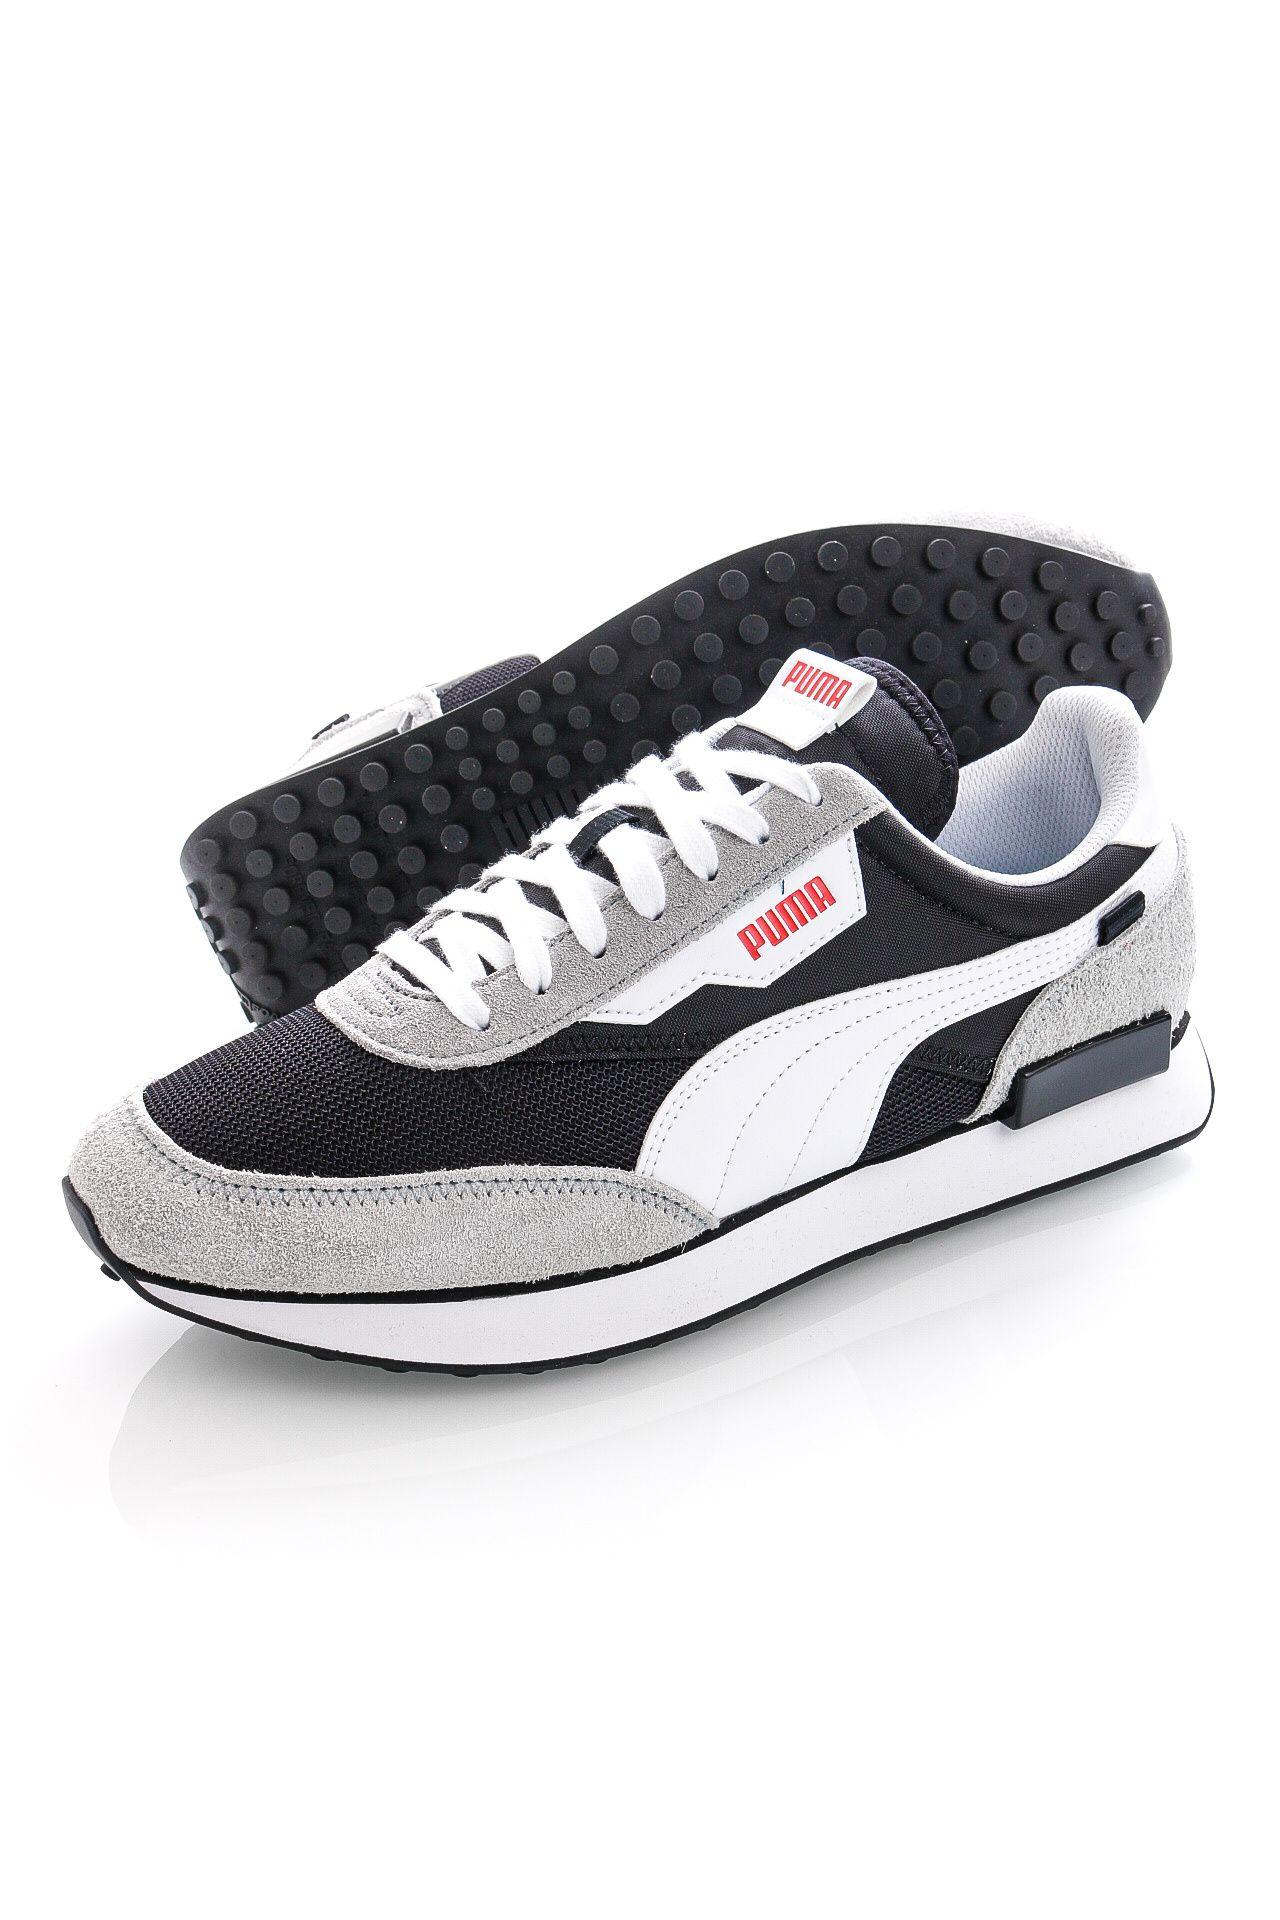 Afbeelding van Puma Sneakers Future Rider Vintage Puma Black-Quarry 38046401